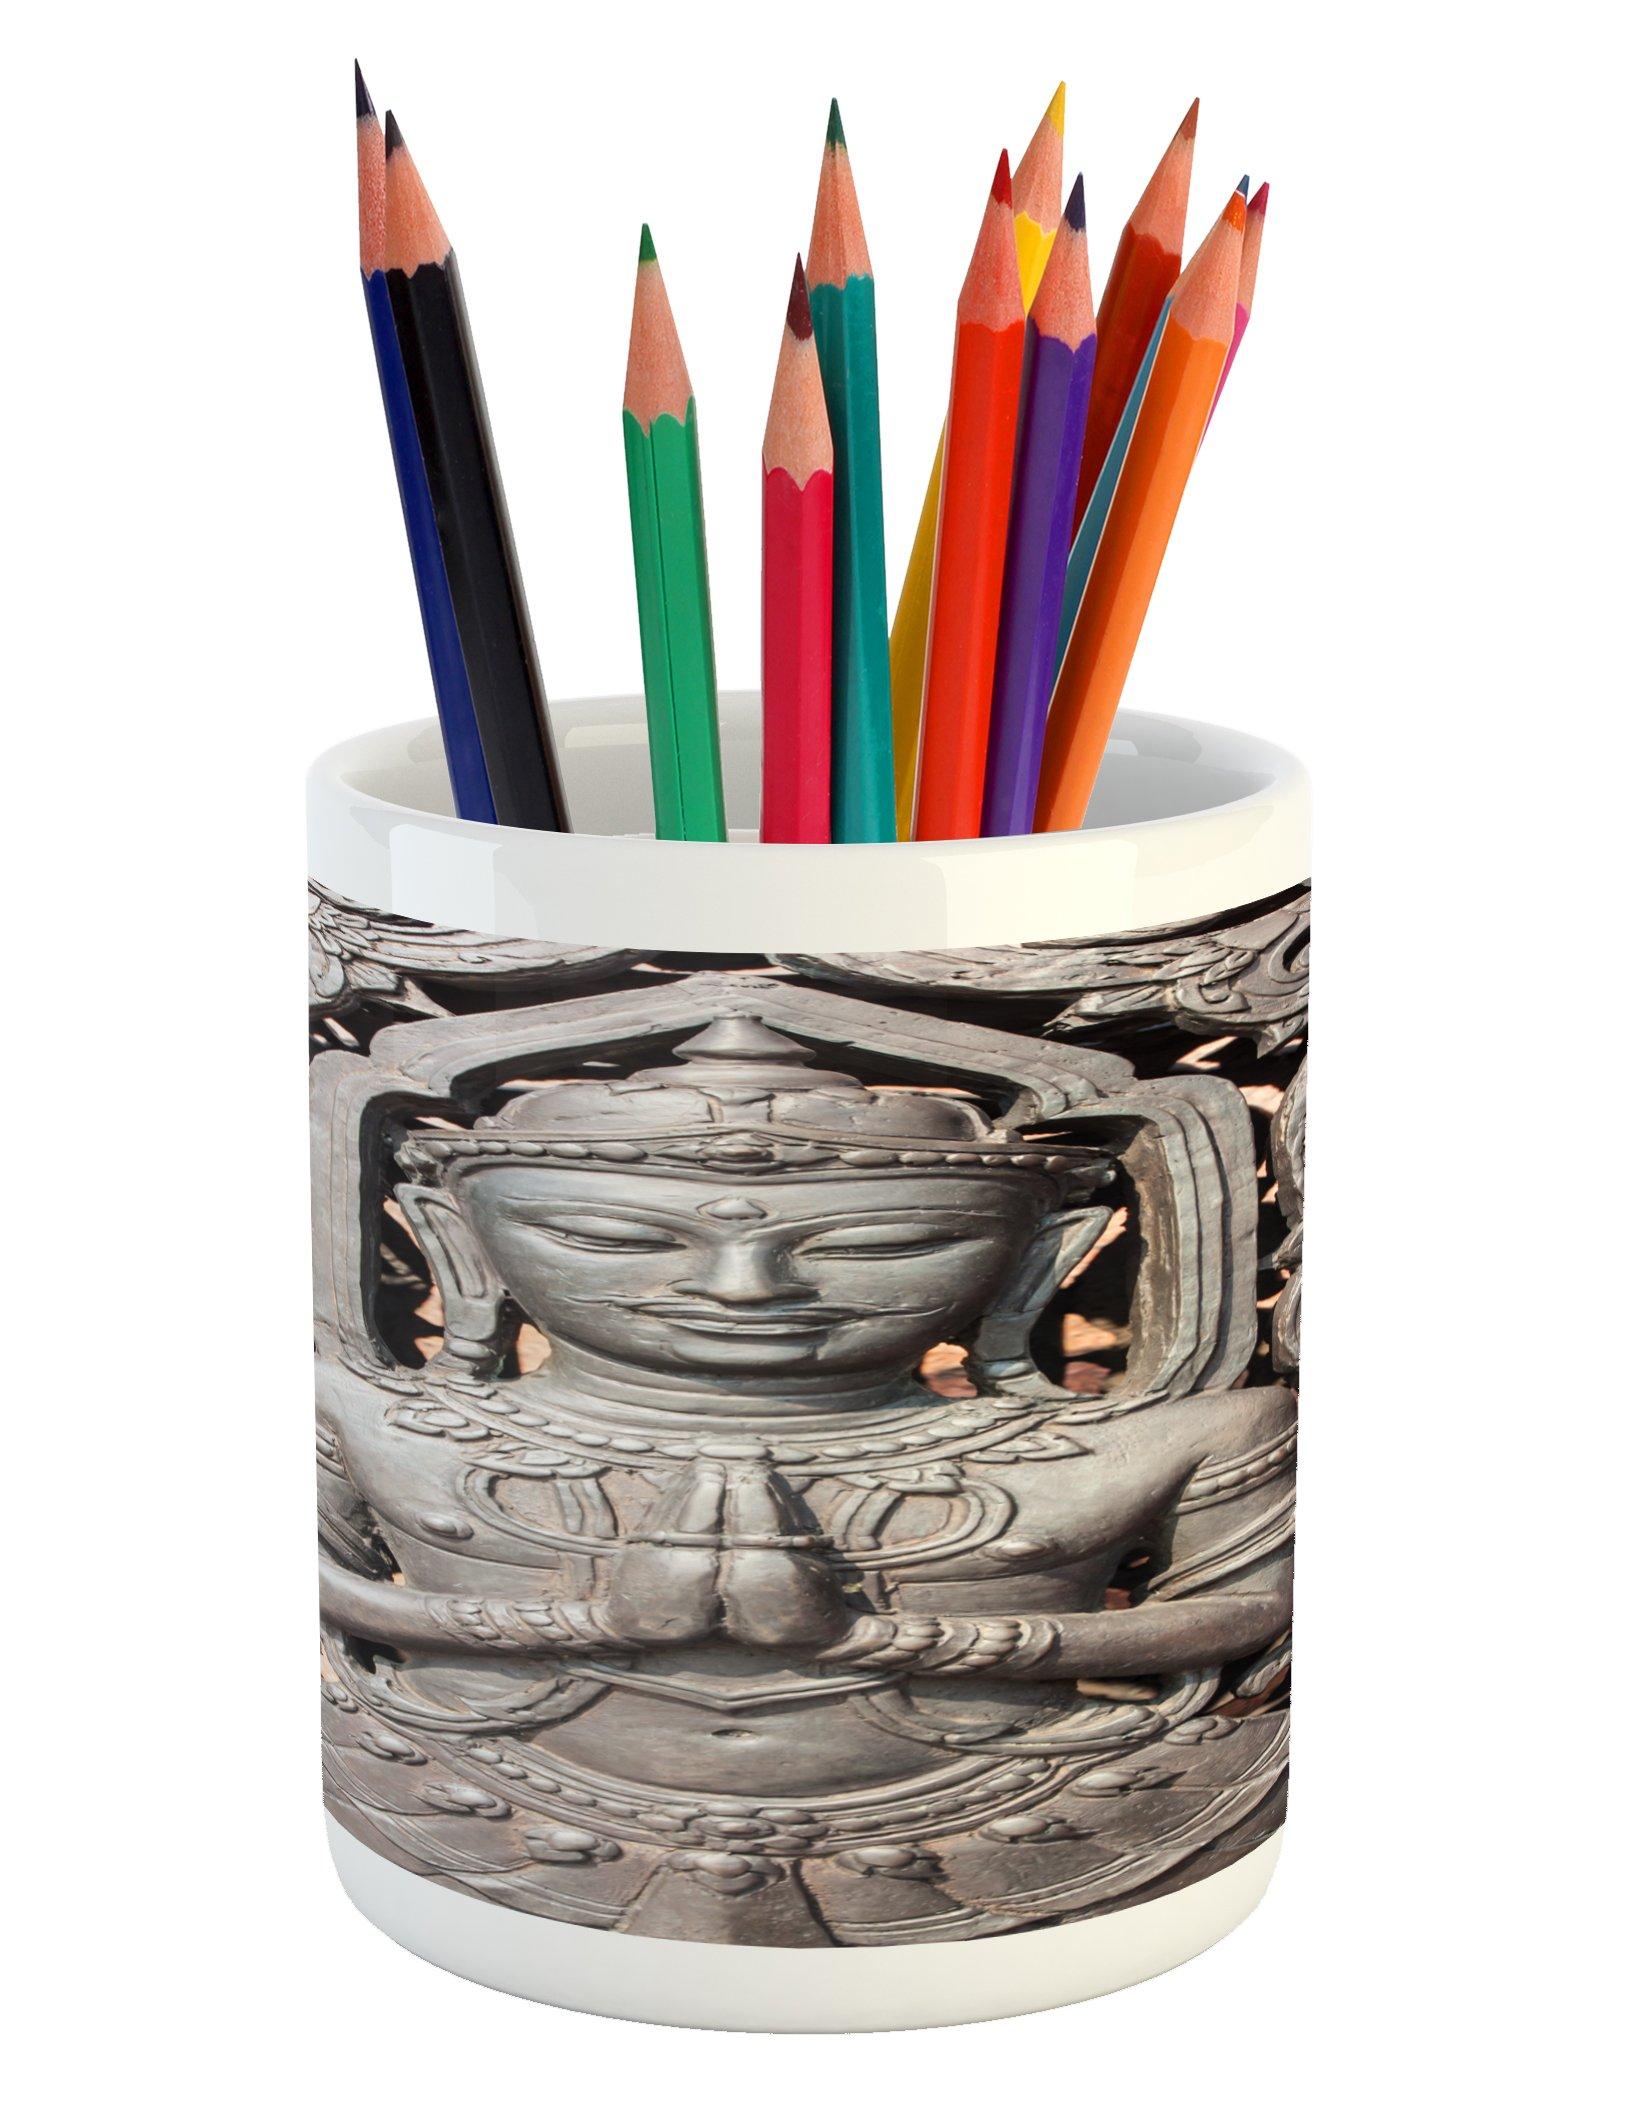 Lunarable Asian Pencil Pen Holder, Antique Style Sculpture Traditional Thai Art Swirling Floral Patterns Japanese Elements, Printed Ceramic Pencil Pen Holder for Desk Office Accessory, Bronze